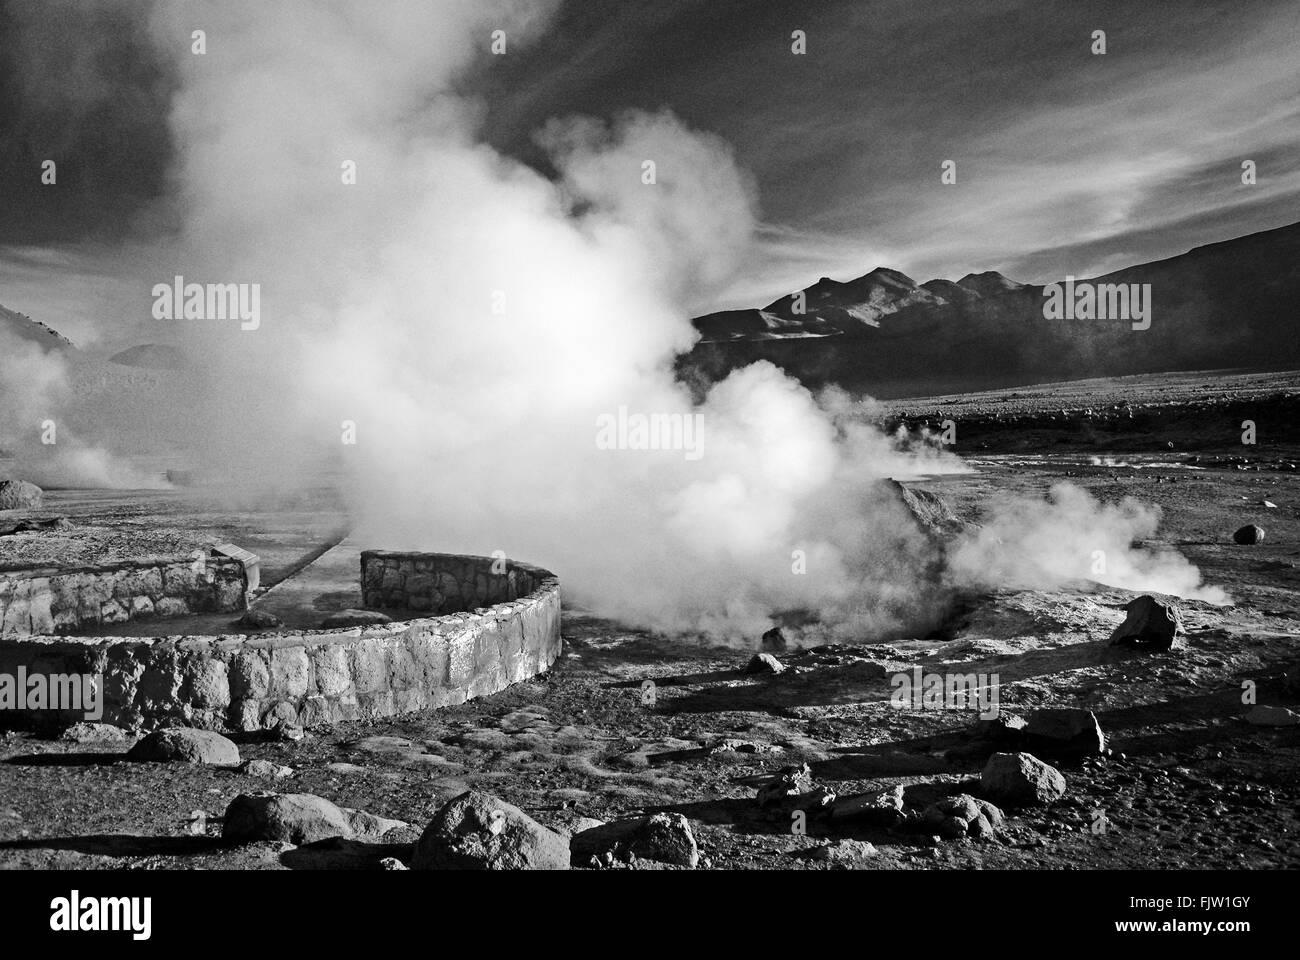 Steam On Landscape - Stock Image